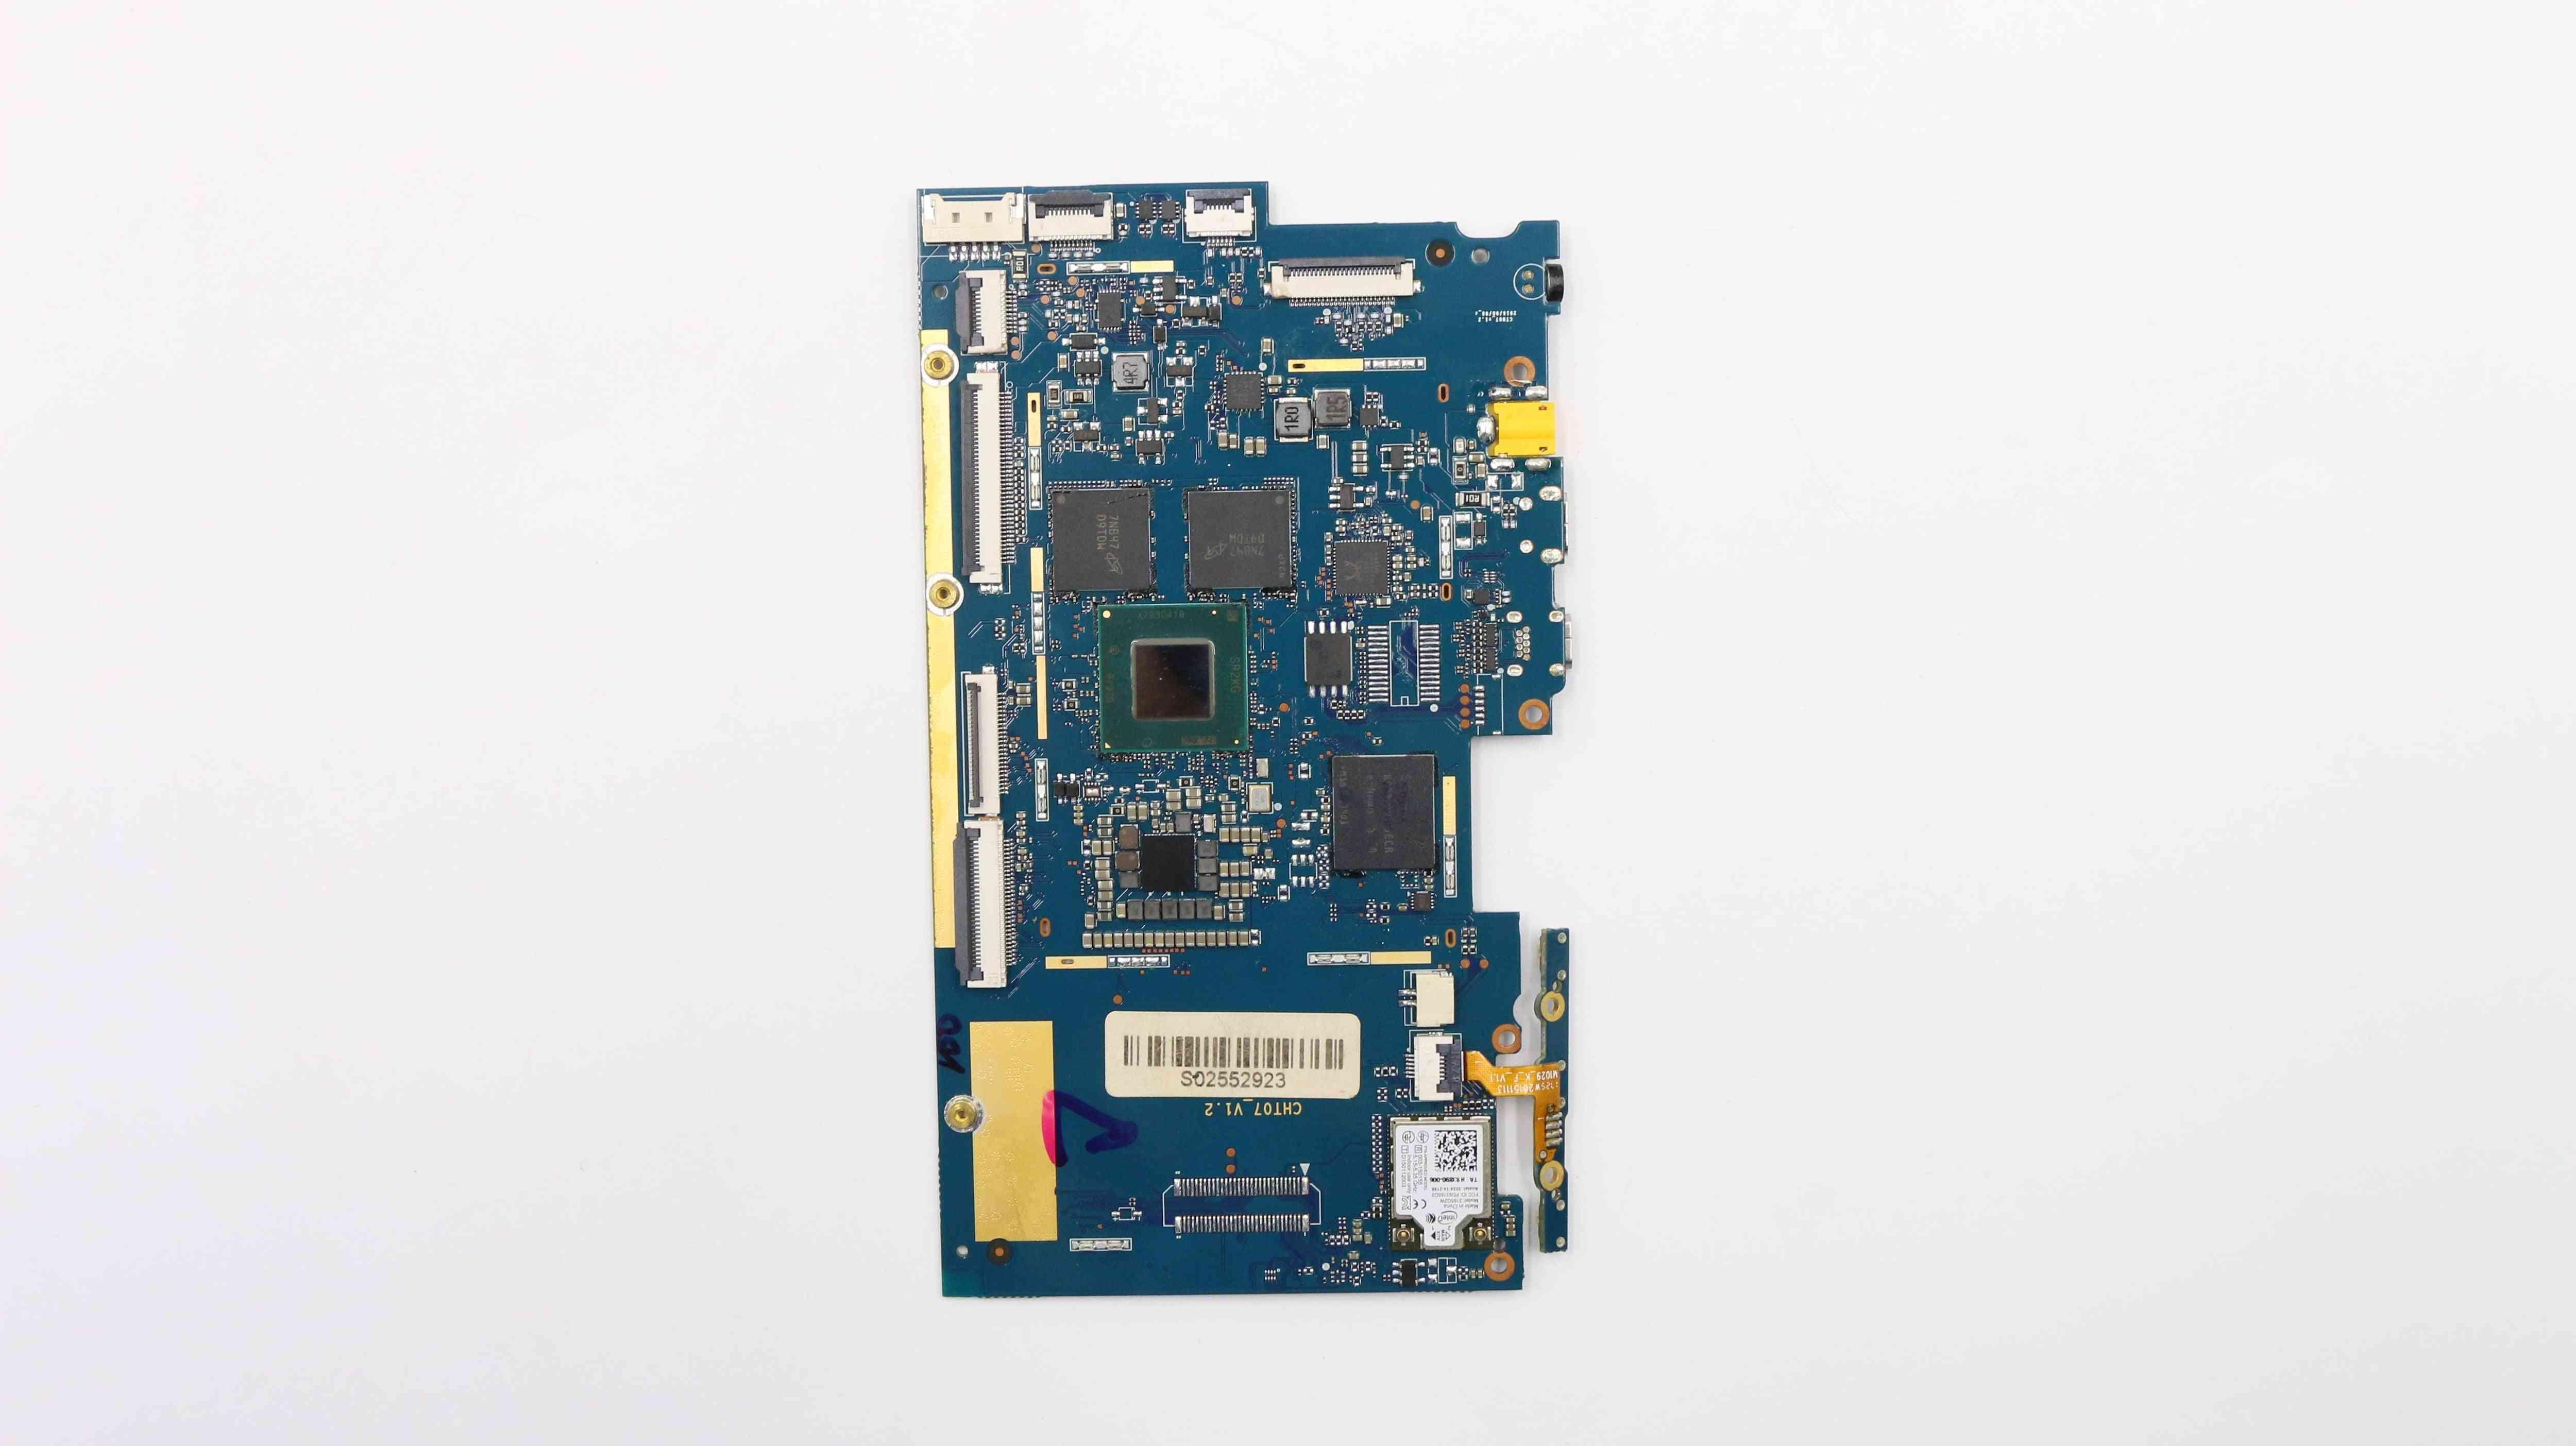 Miix 310-10icr, Tablet Motherboard For Ideapad Yf80sg, Fru 5b20l55196/ M1029cwp